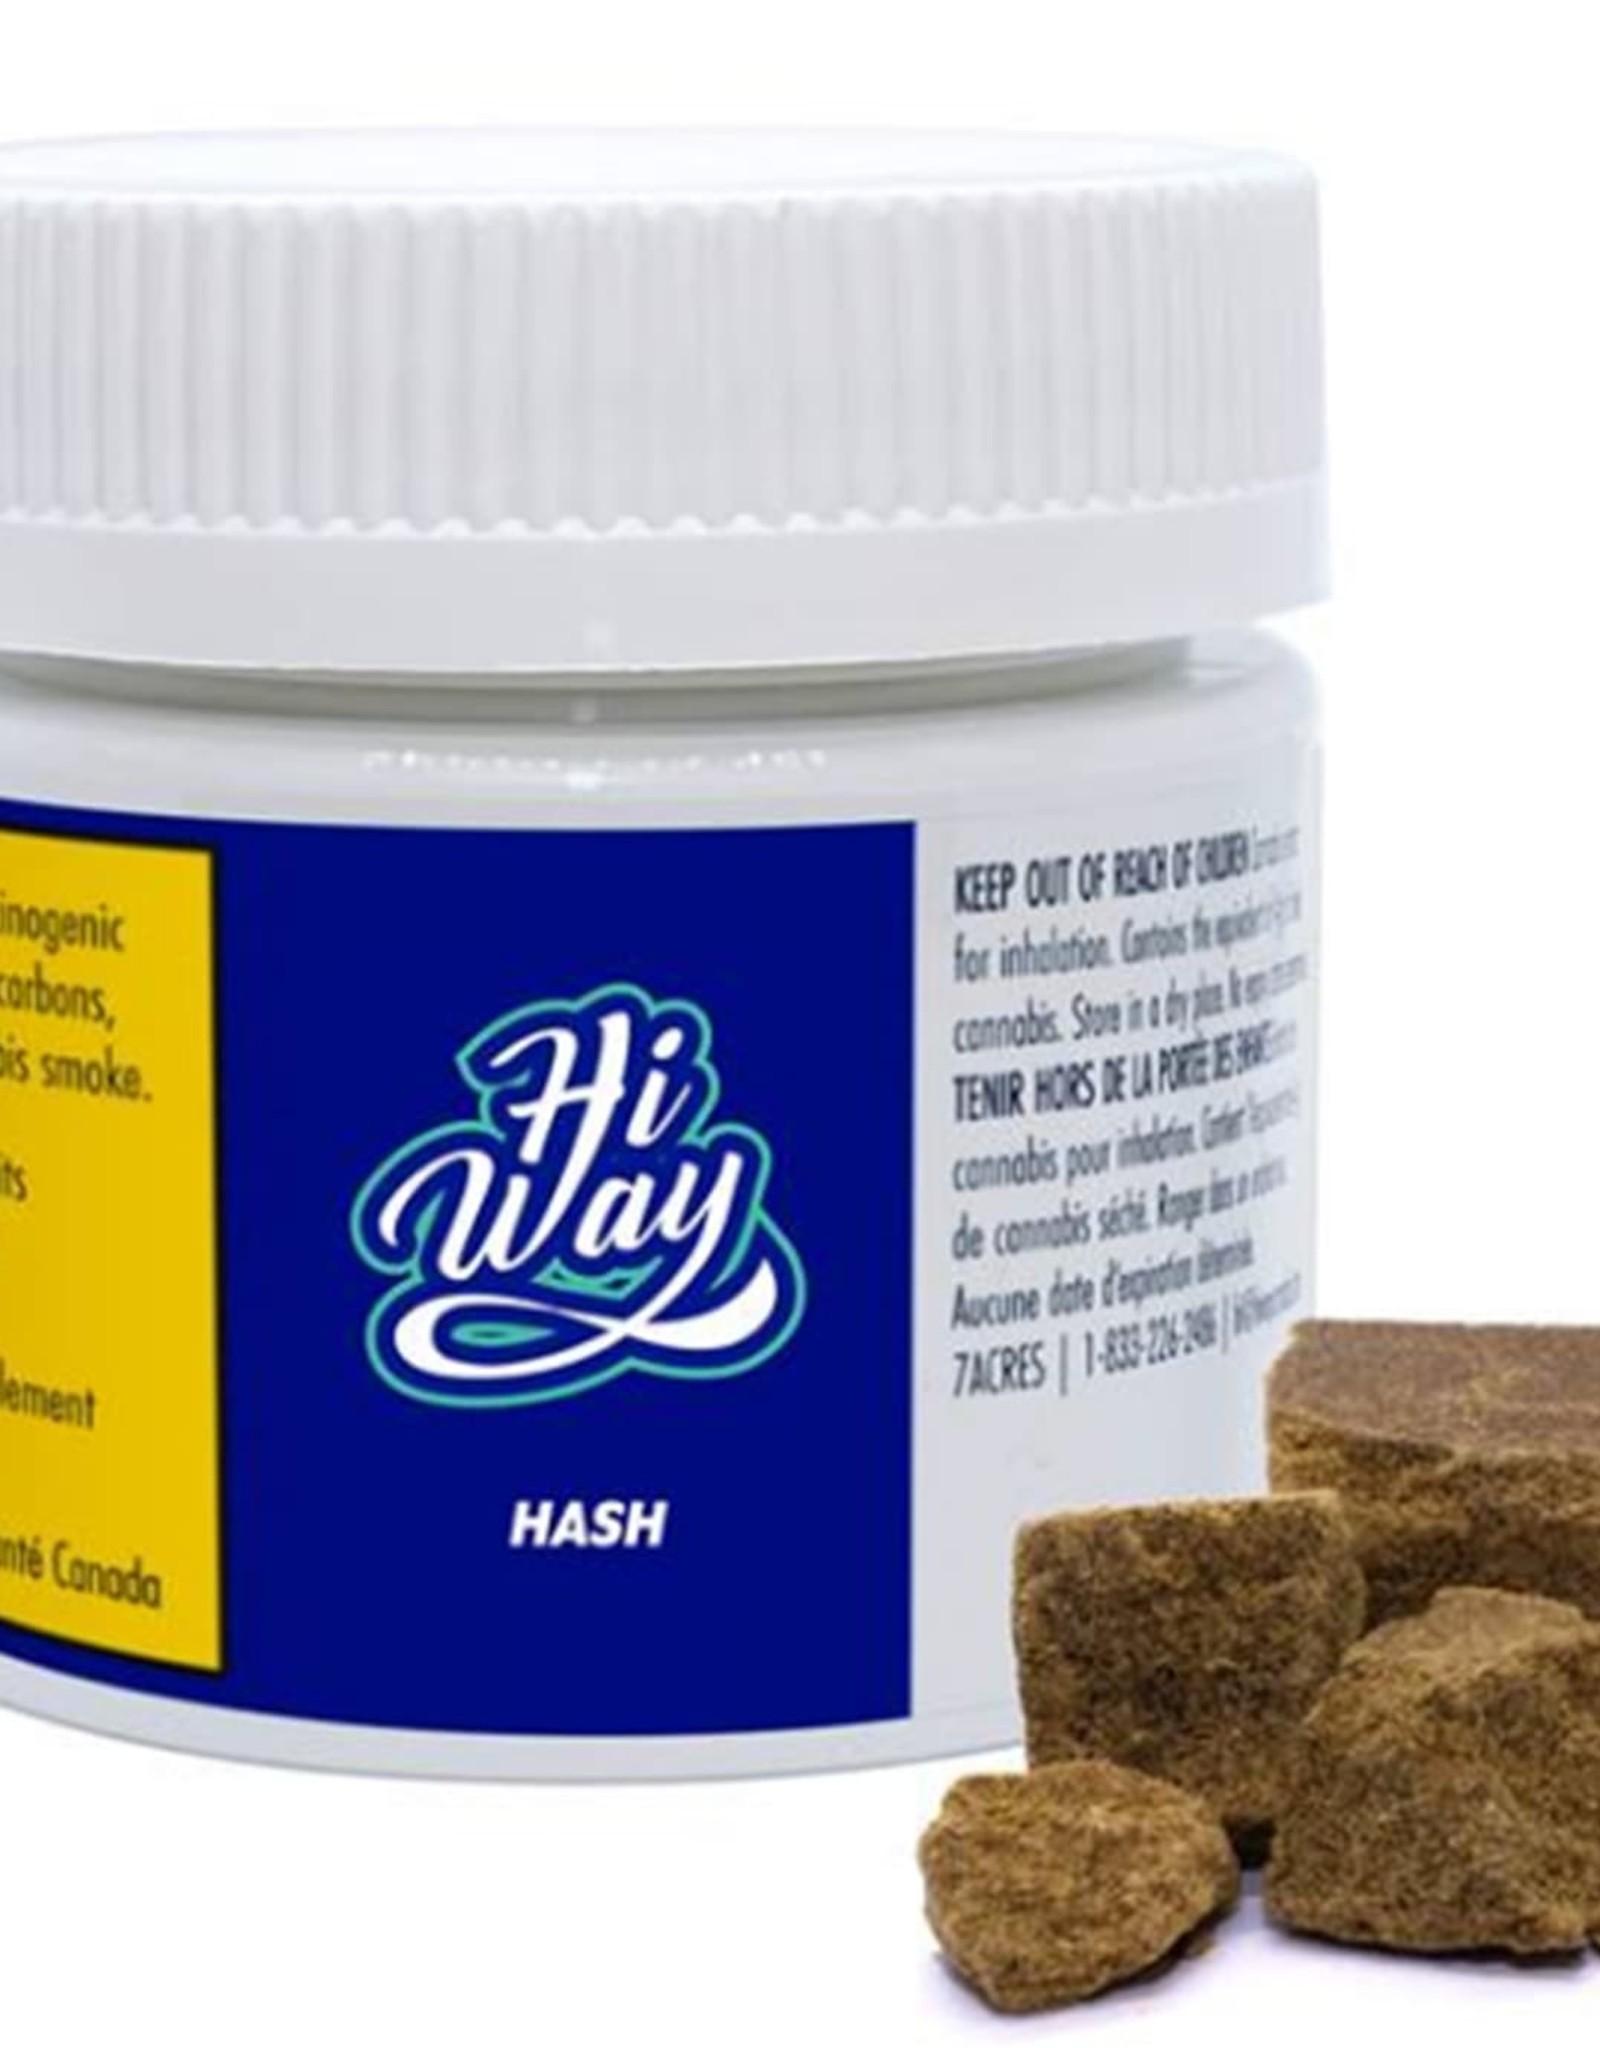 Blissco. **Blissco - Hiway Hash - 2g